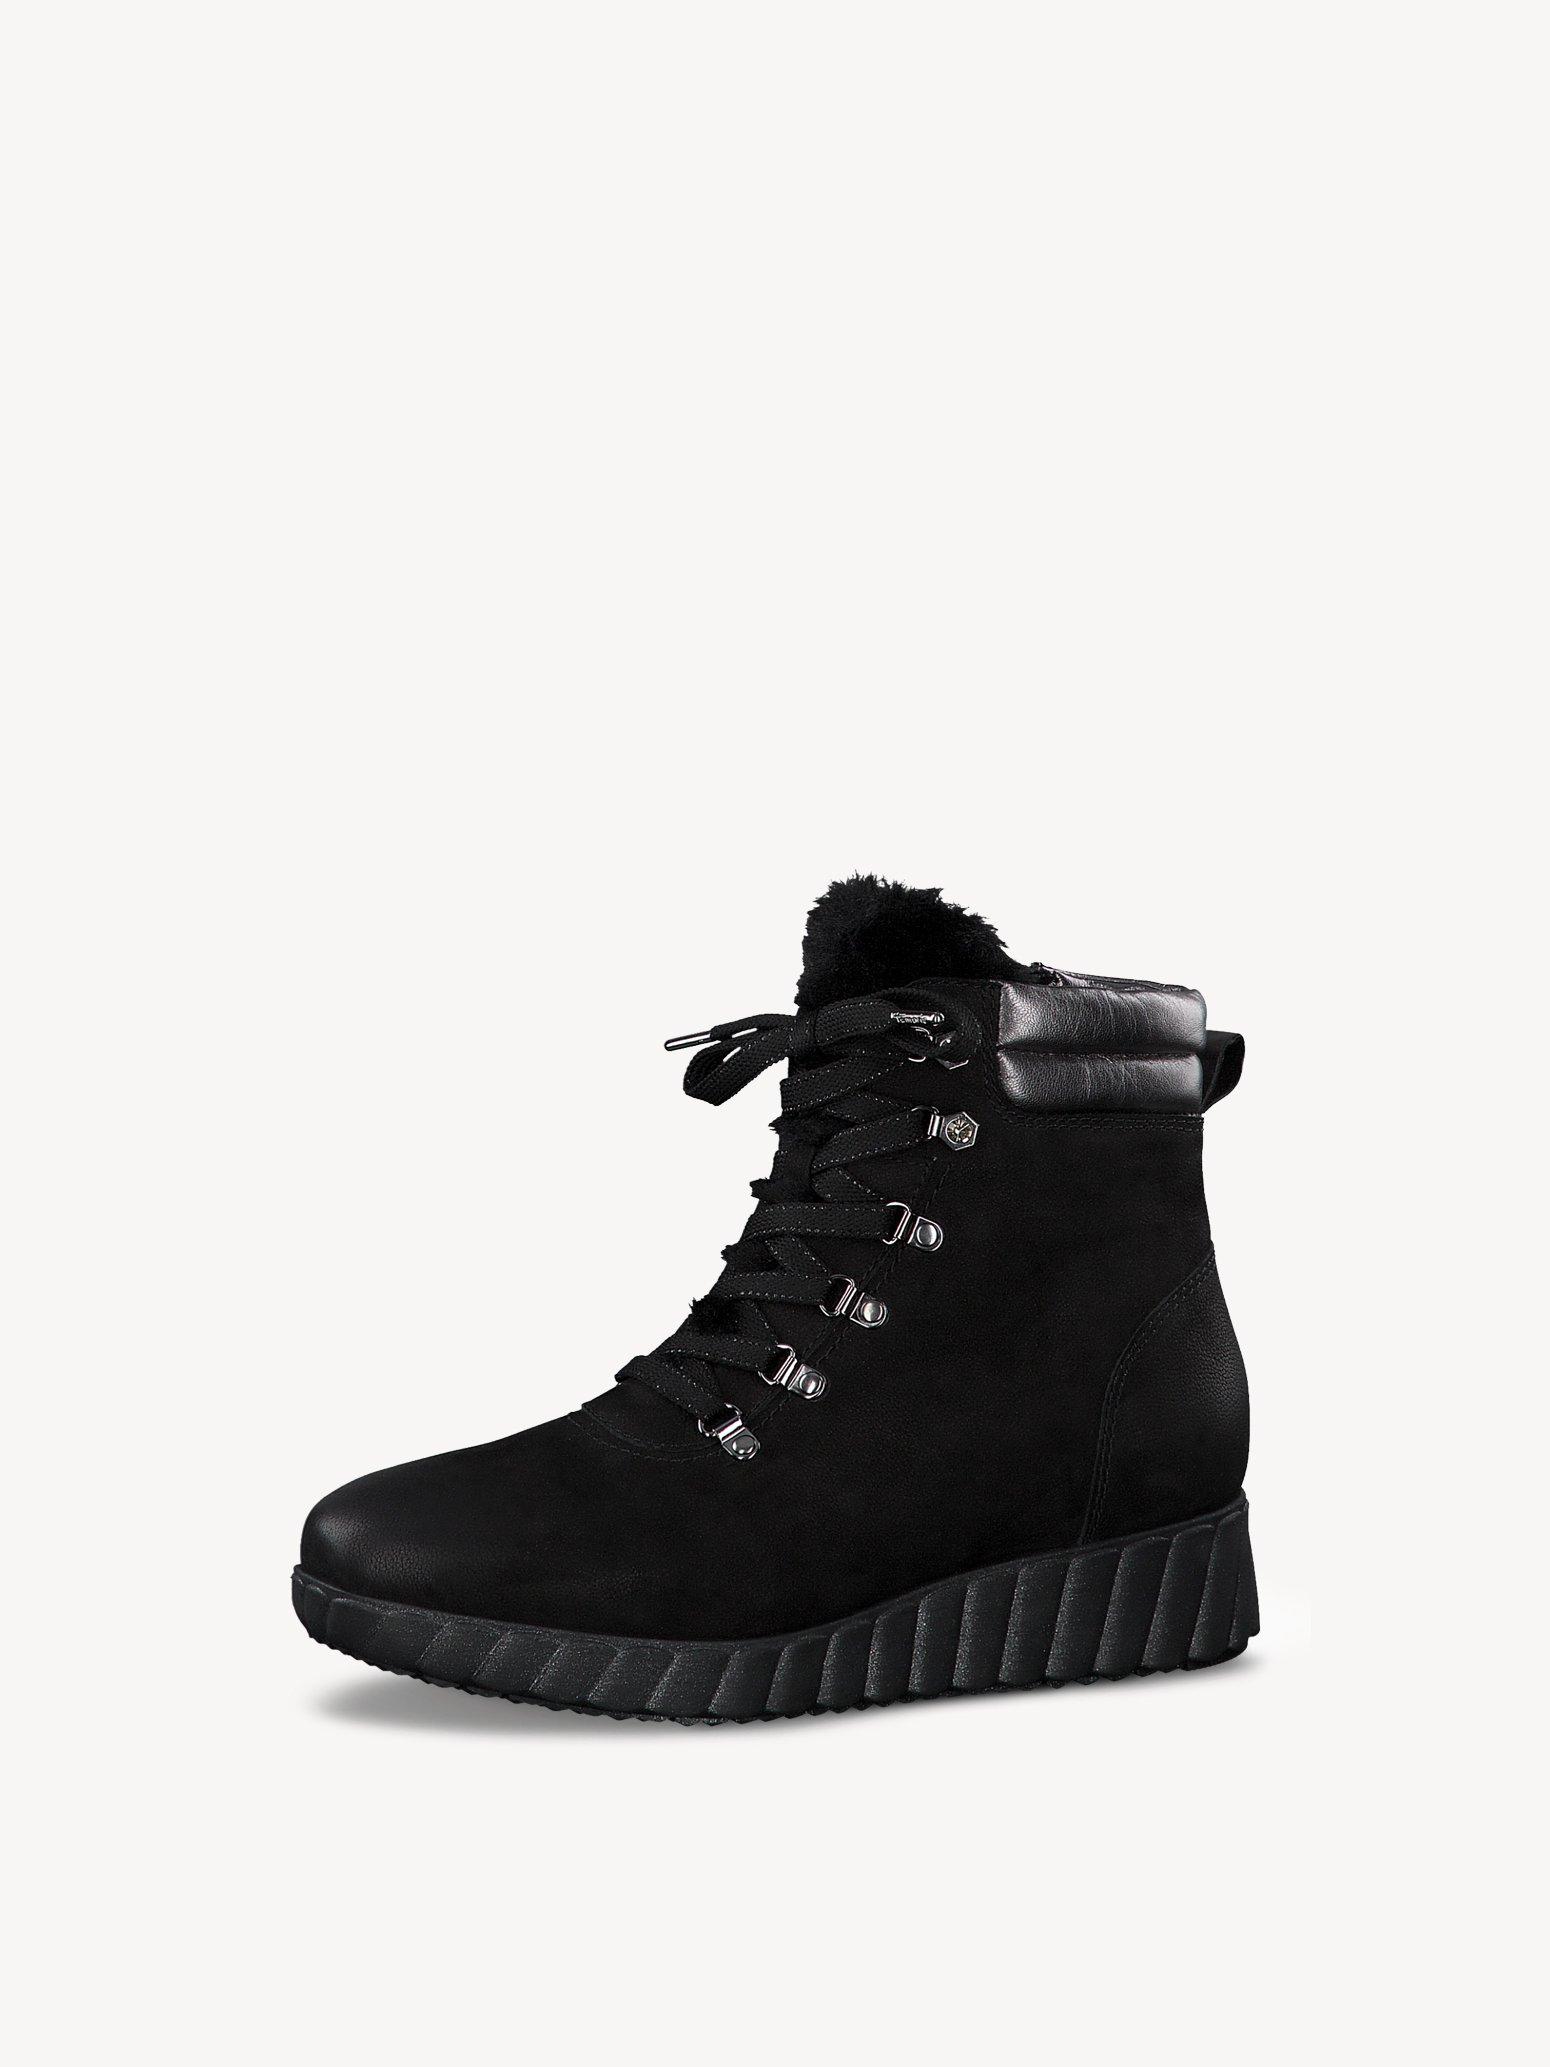 Ботинки Tamaris 1-1-26295-25-001